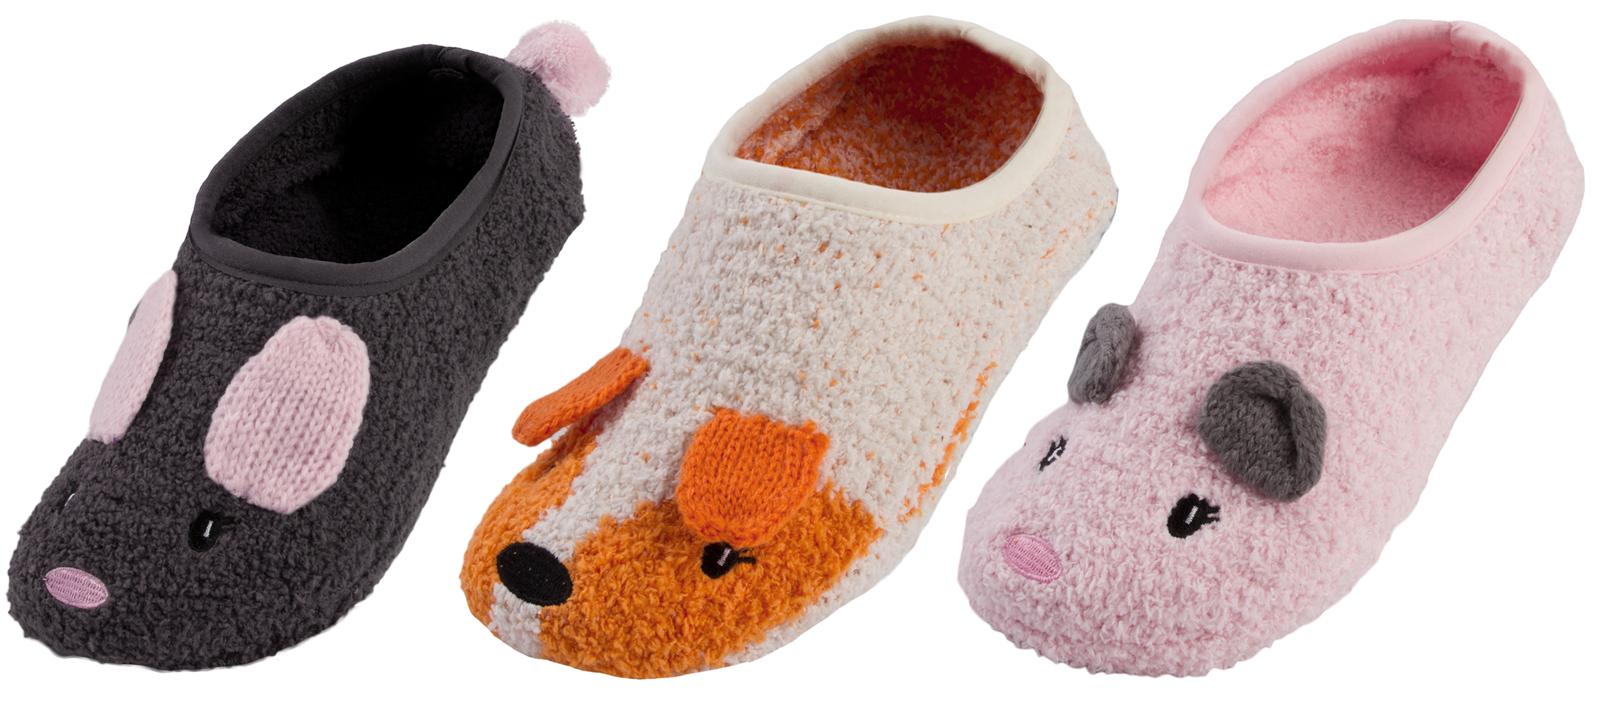 Ladies Cute Fox Novelty Non Skid Faux Fur lined Slipper Socks